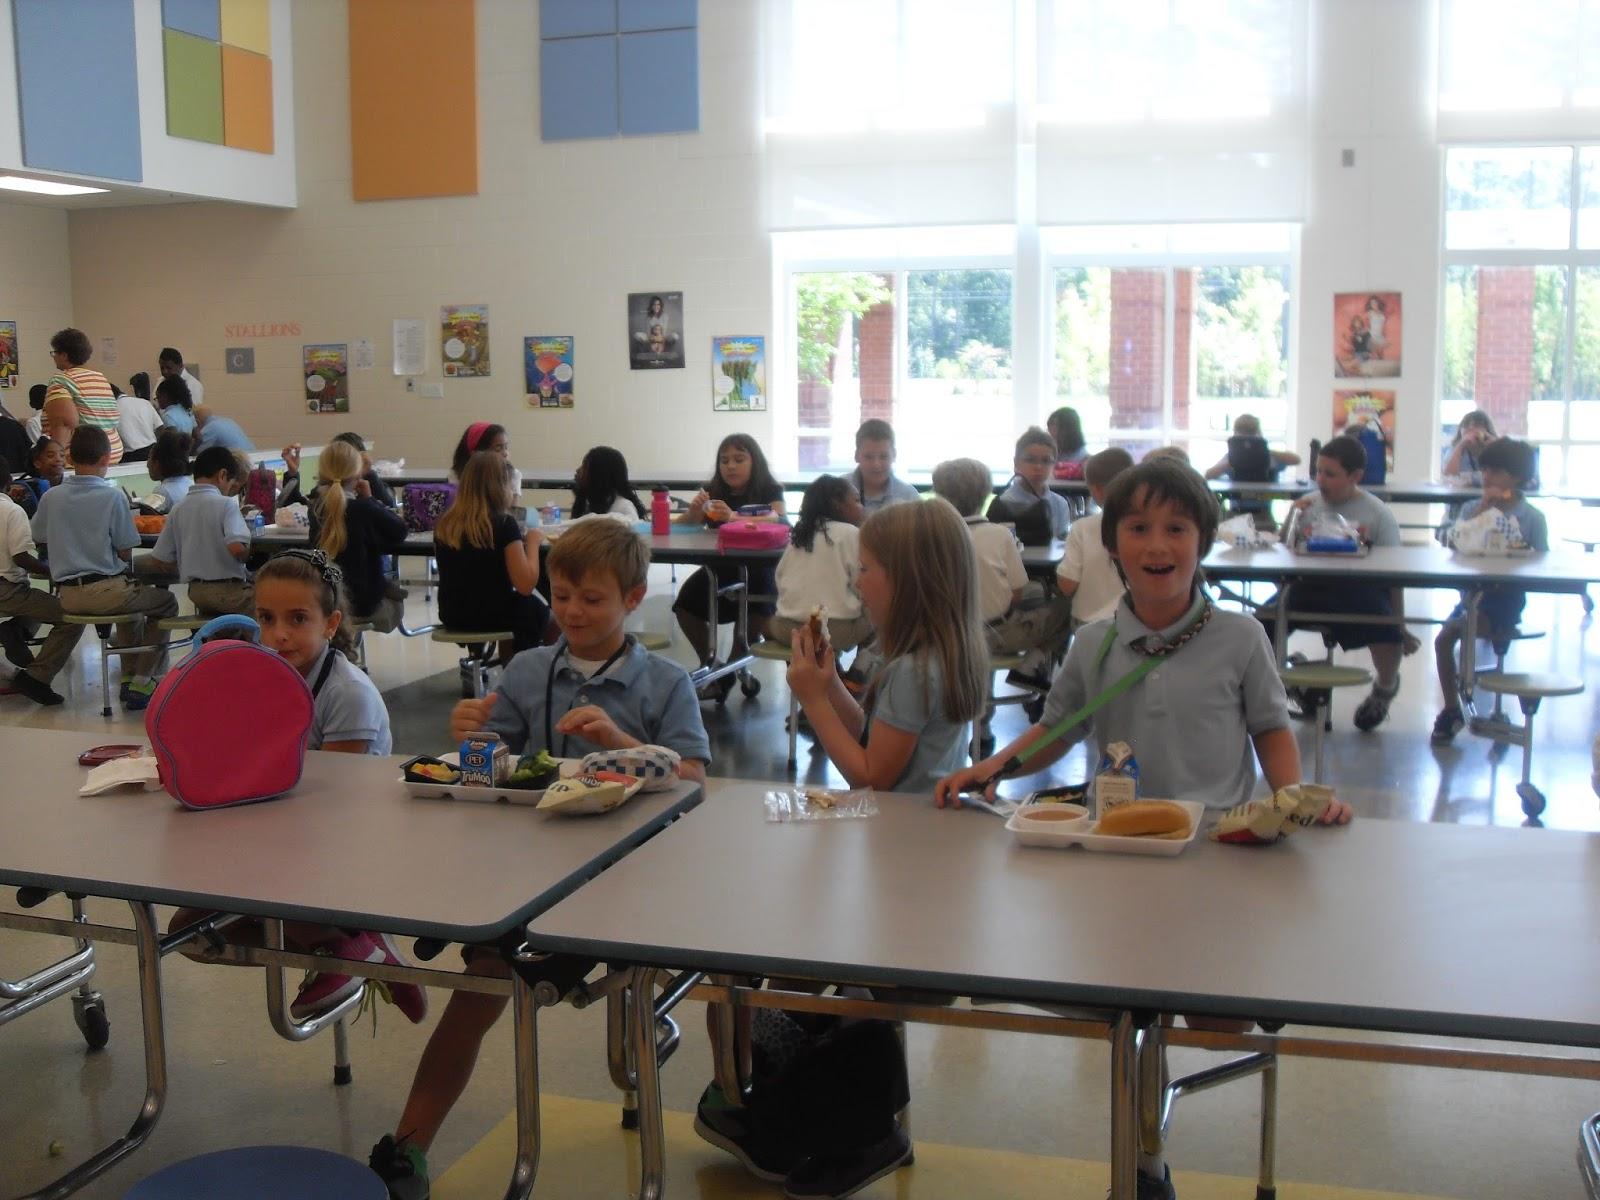 Mrs. Povie's Class - 2013-2014